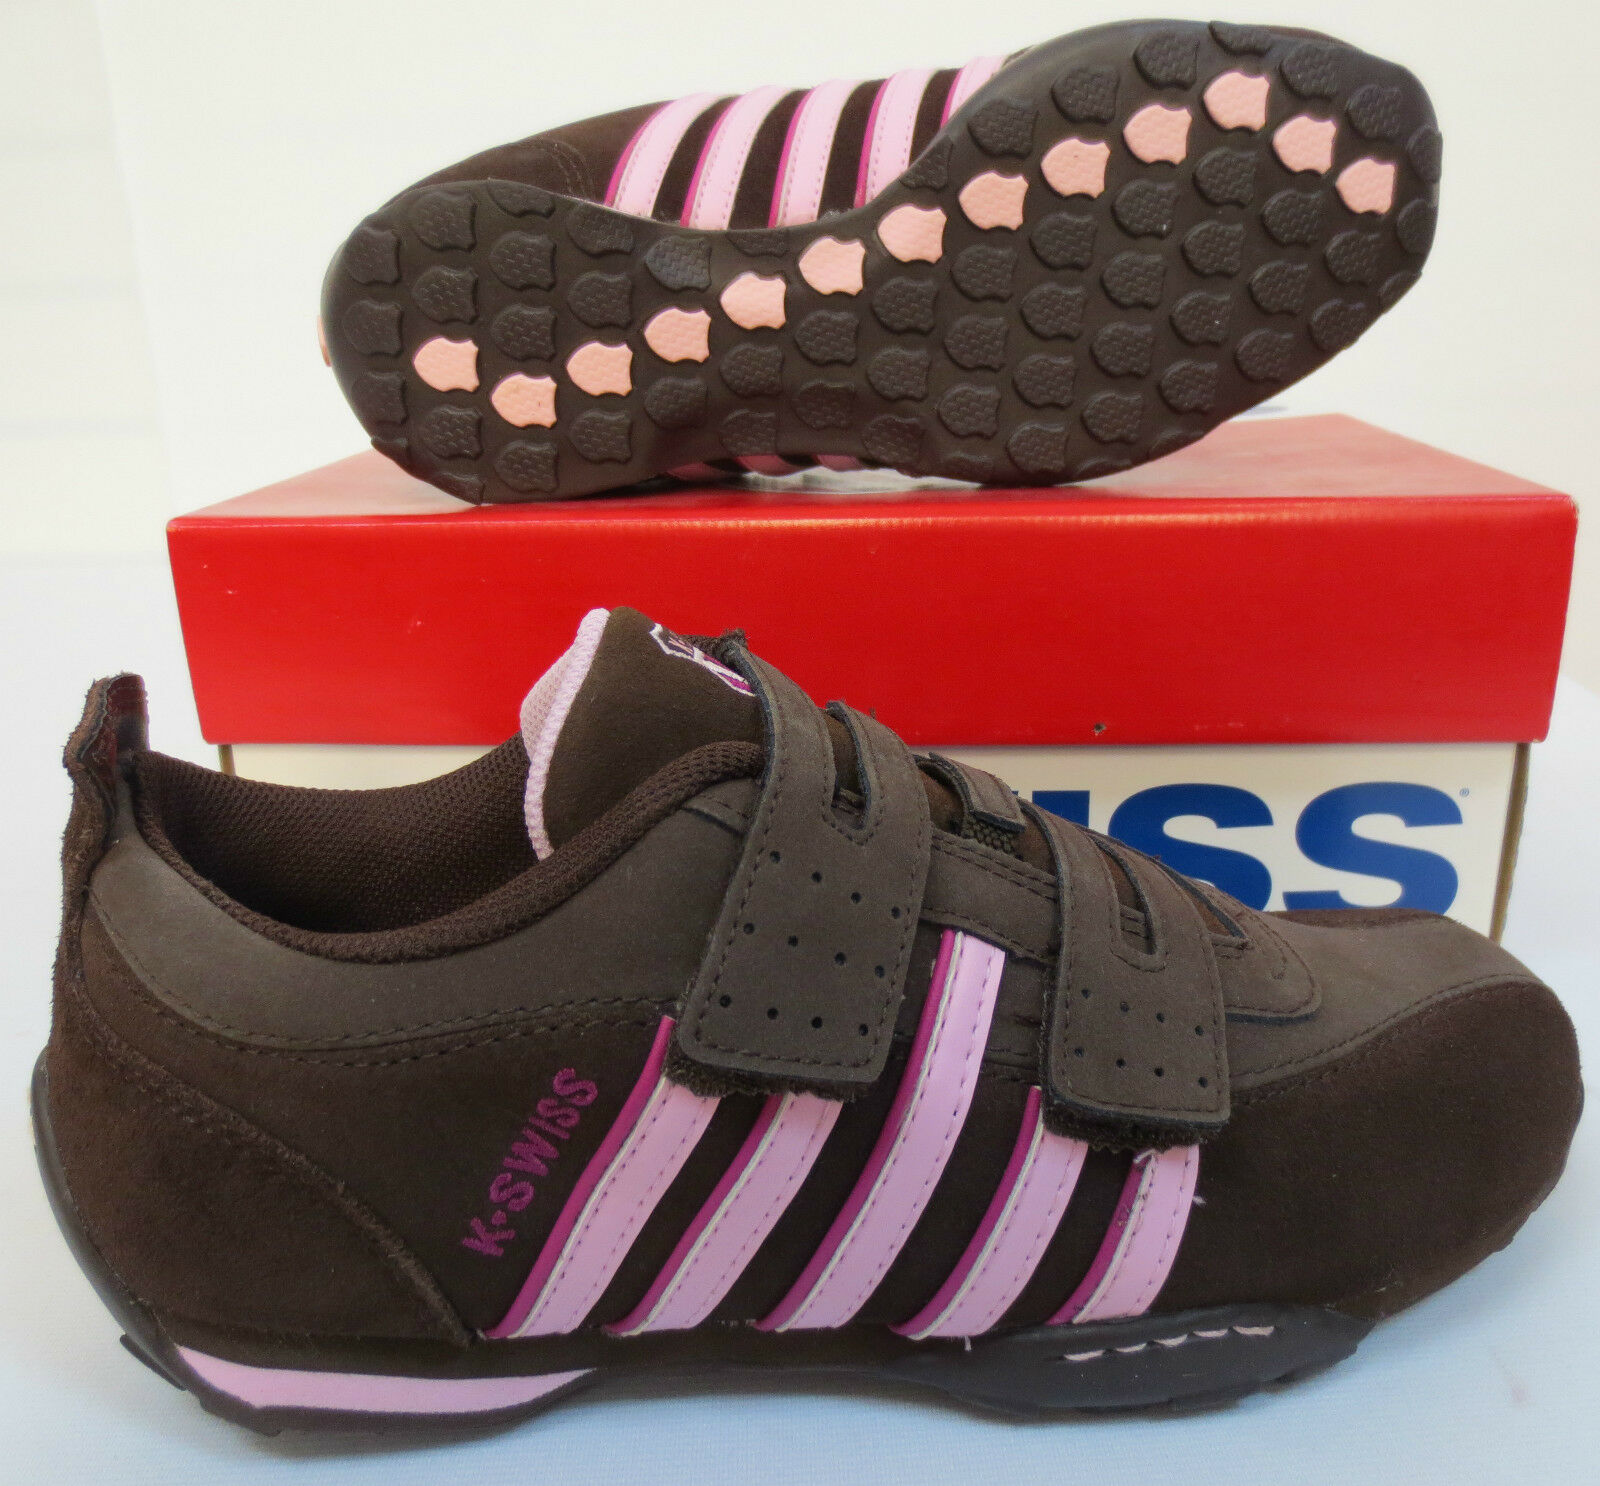 K SWISS Damenschuhe ARVEE SP STRAP LOW CASUAL RUNNING WALKING STYLISH WORK OUT Schuhe